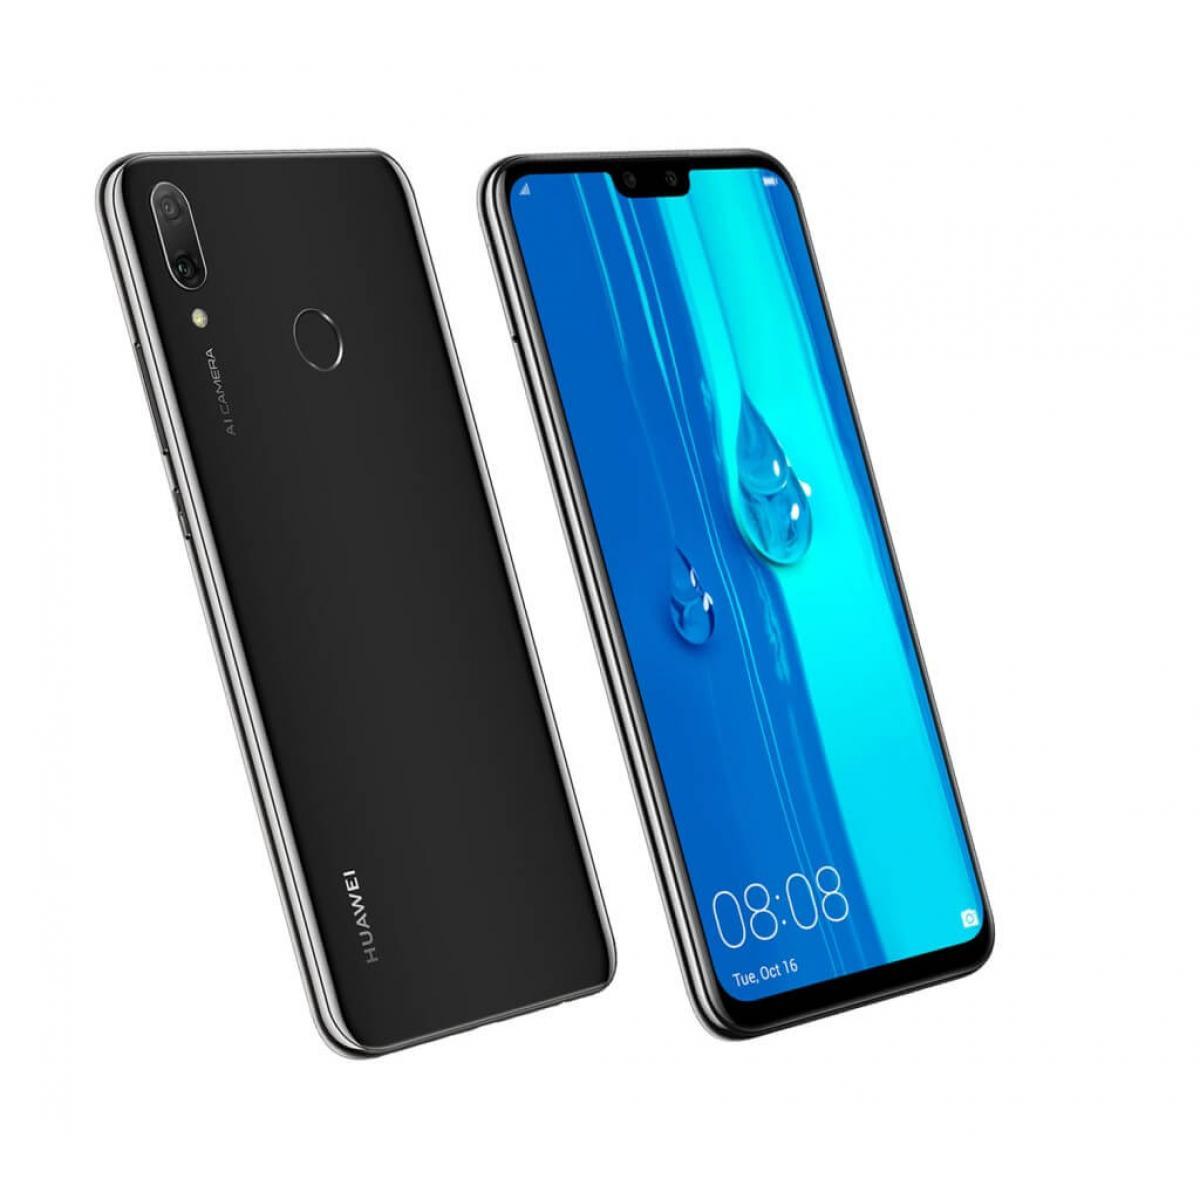 Mobile Phone Huawei Y9 Prime 2019 | GTS - Amman Jordan | GTS